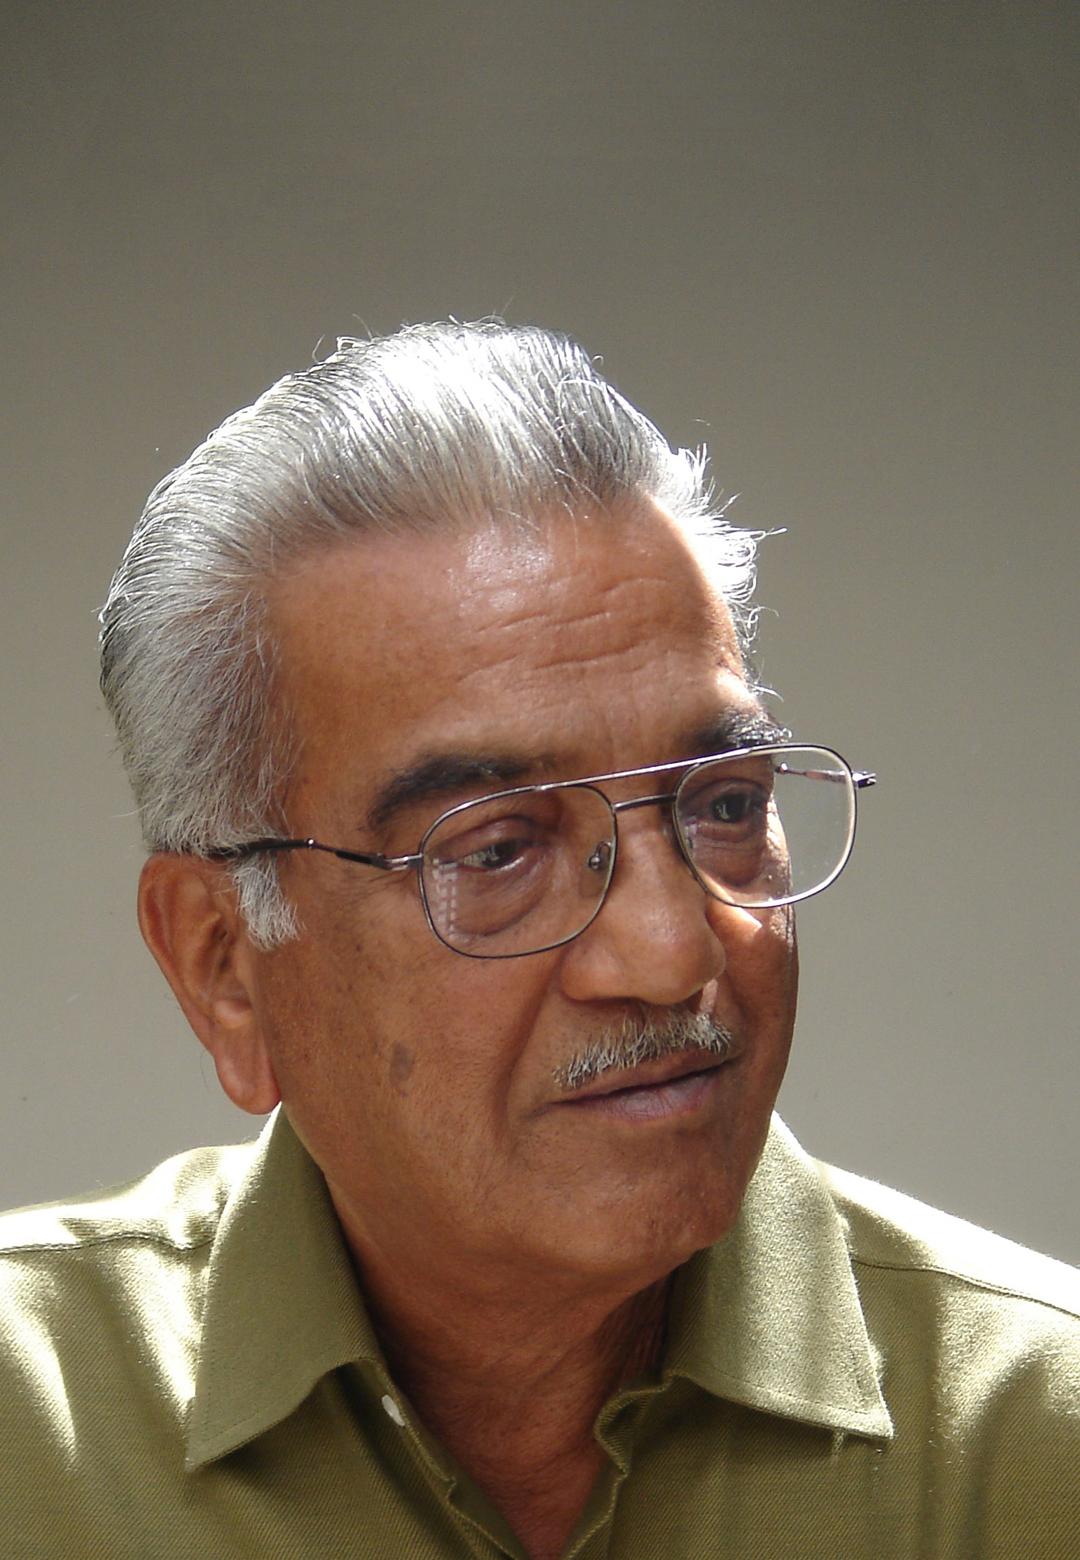 Hasmukh Patel | Hasmukh Patel Architecture Style | Bimal Patel | STIR